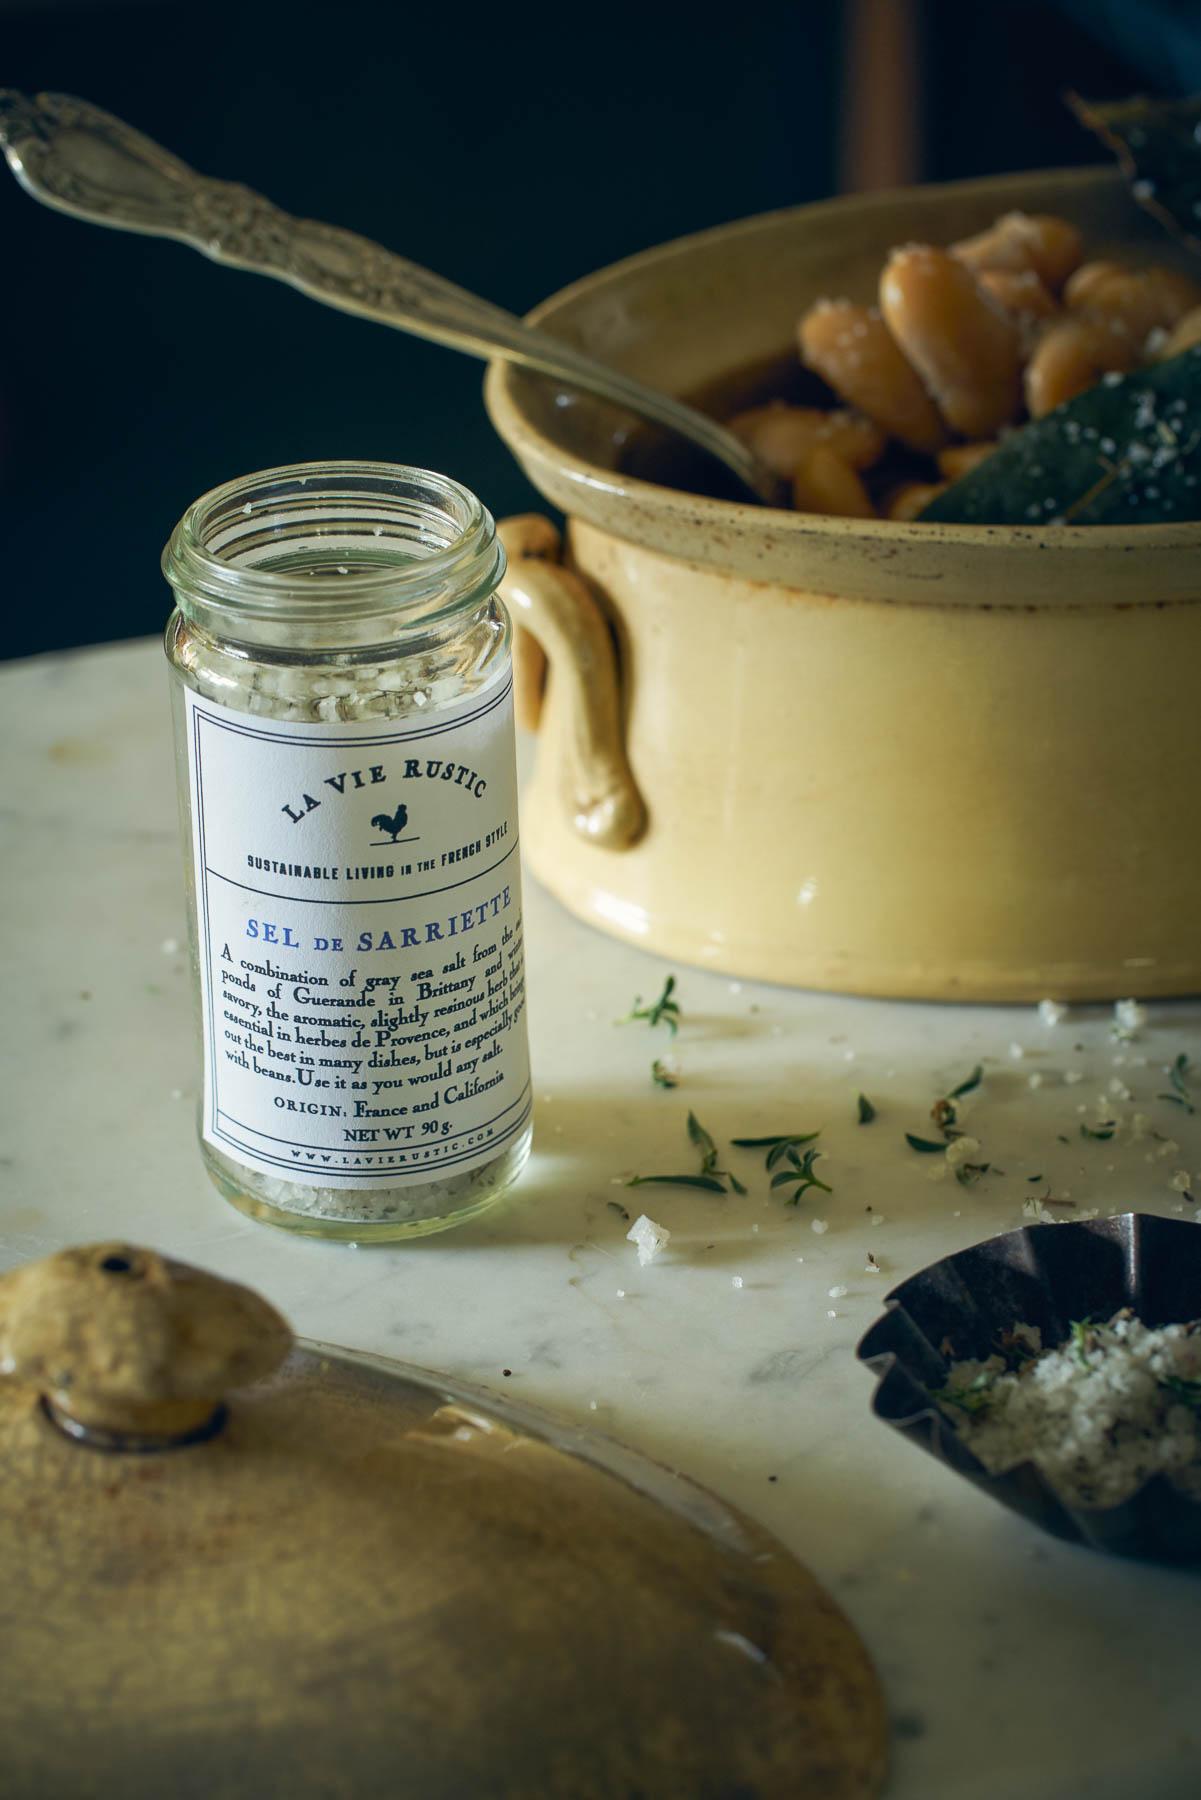 La Vie Rustic White Bean and Winter Savory Soup Set